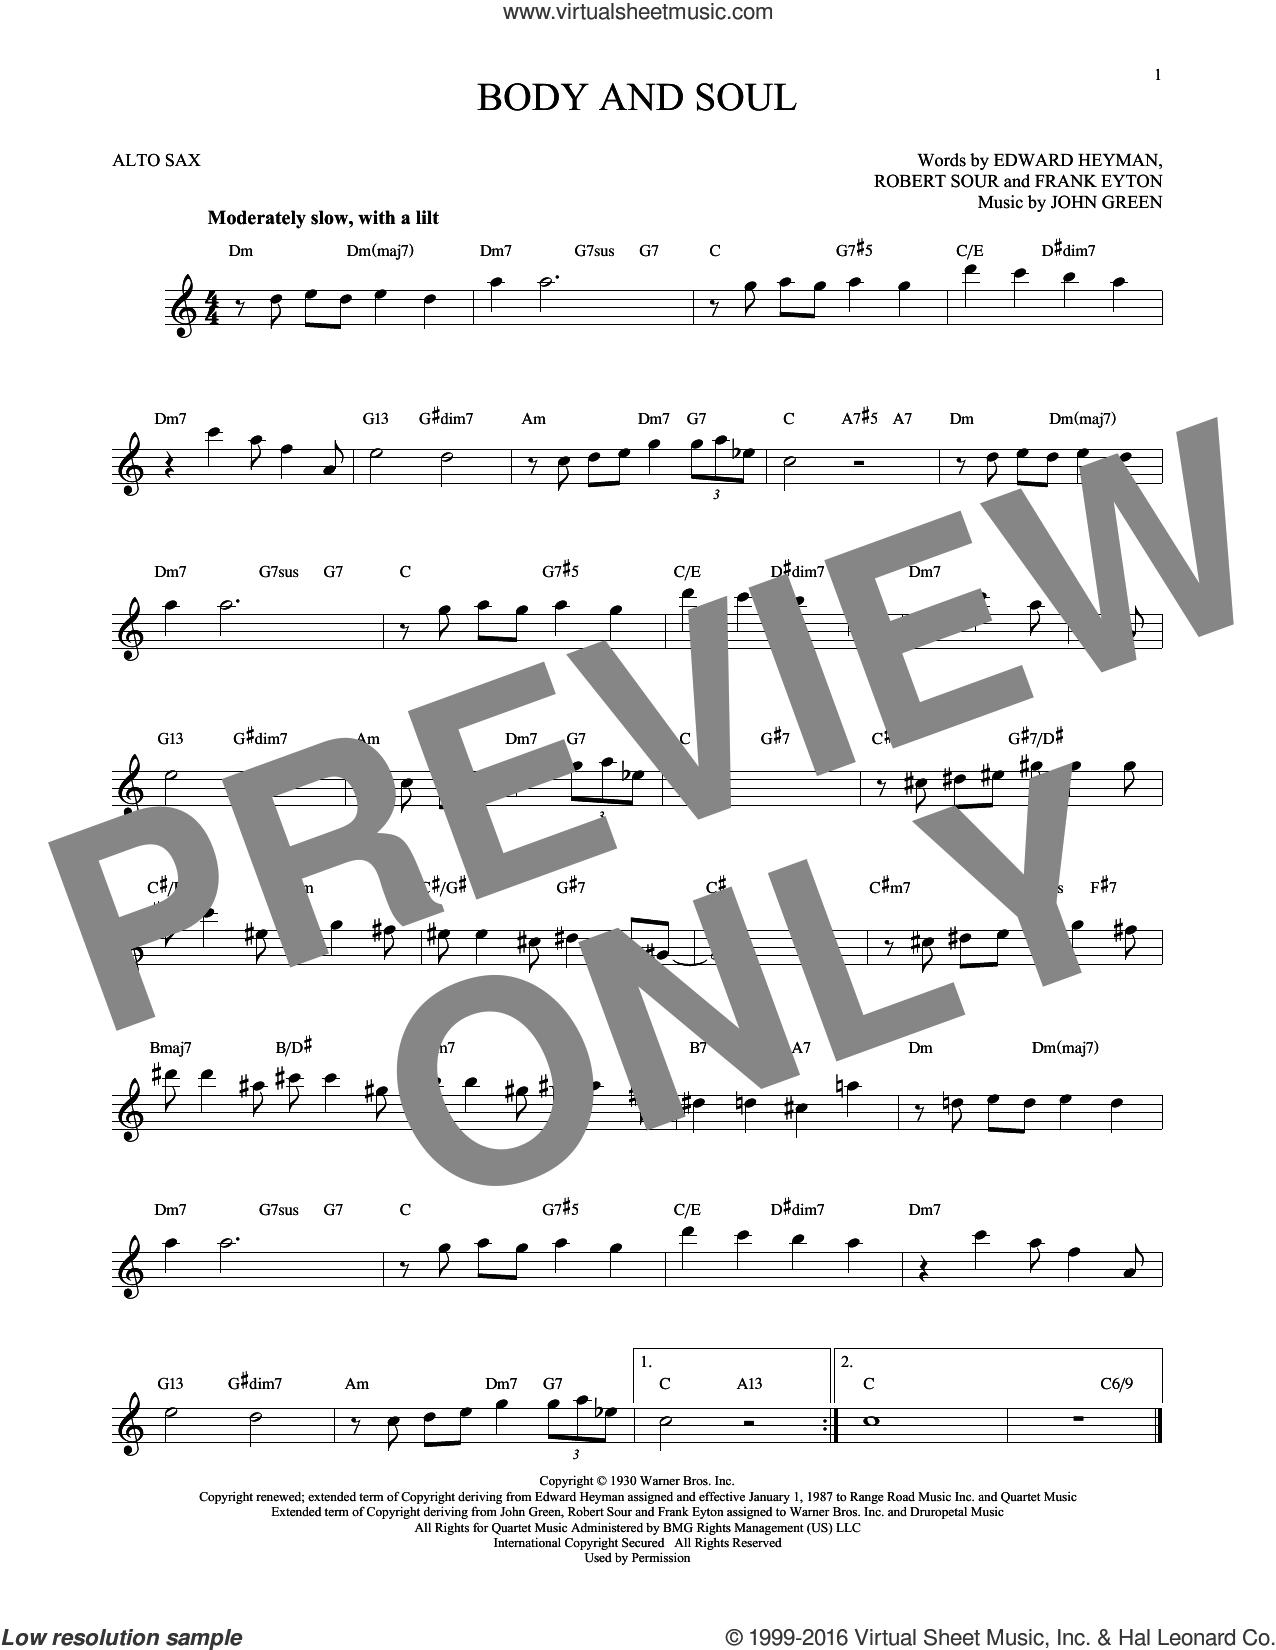 Body And Soul sheet music for alto saxophone solo by Edward Heyman, Tony Bennett & Amy Winehouse, Frank Eyton, Johnny Green and Robert Sour, intermediate skill level